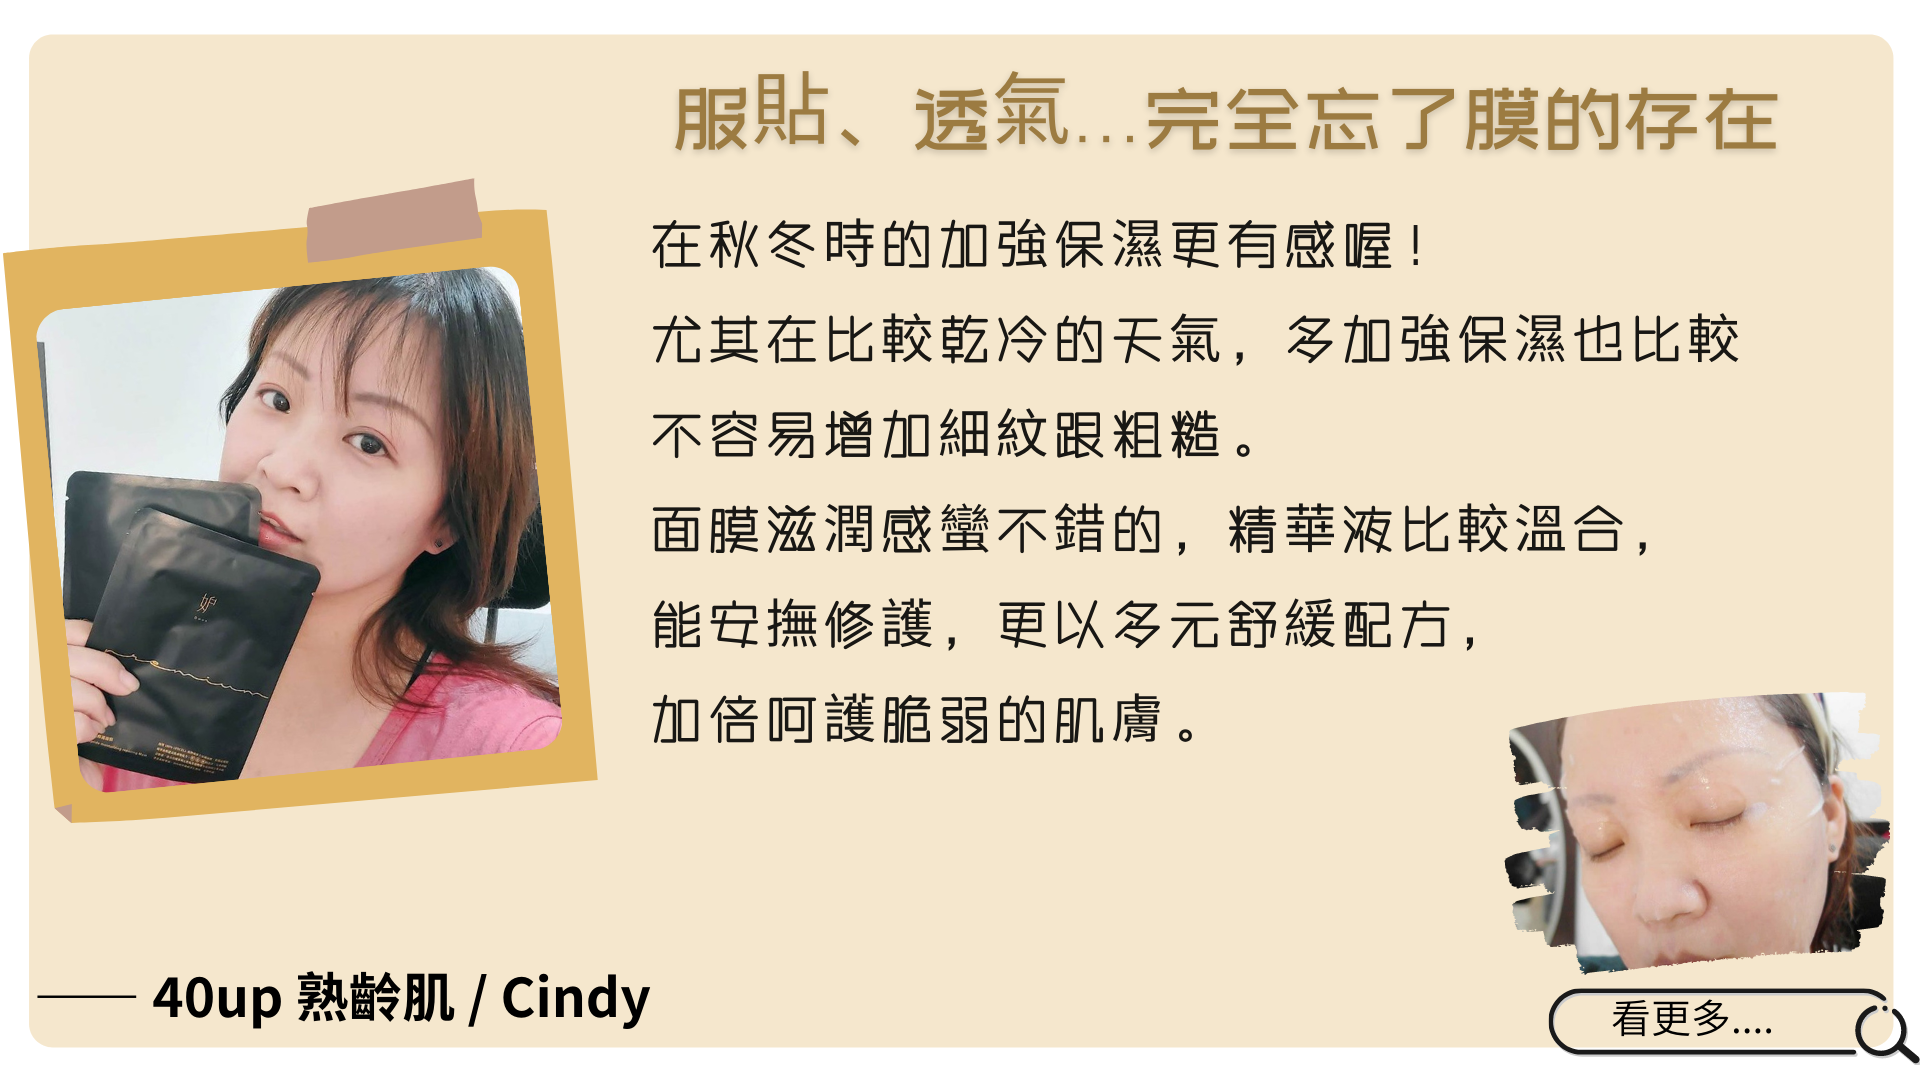 Doux妒 頂級胜肽保濕修護面膜 - 愛用者好評推薦 / Cindy